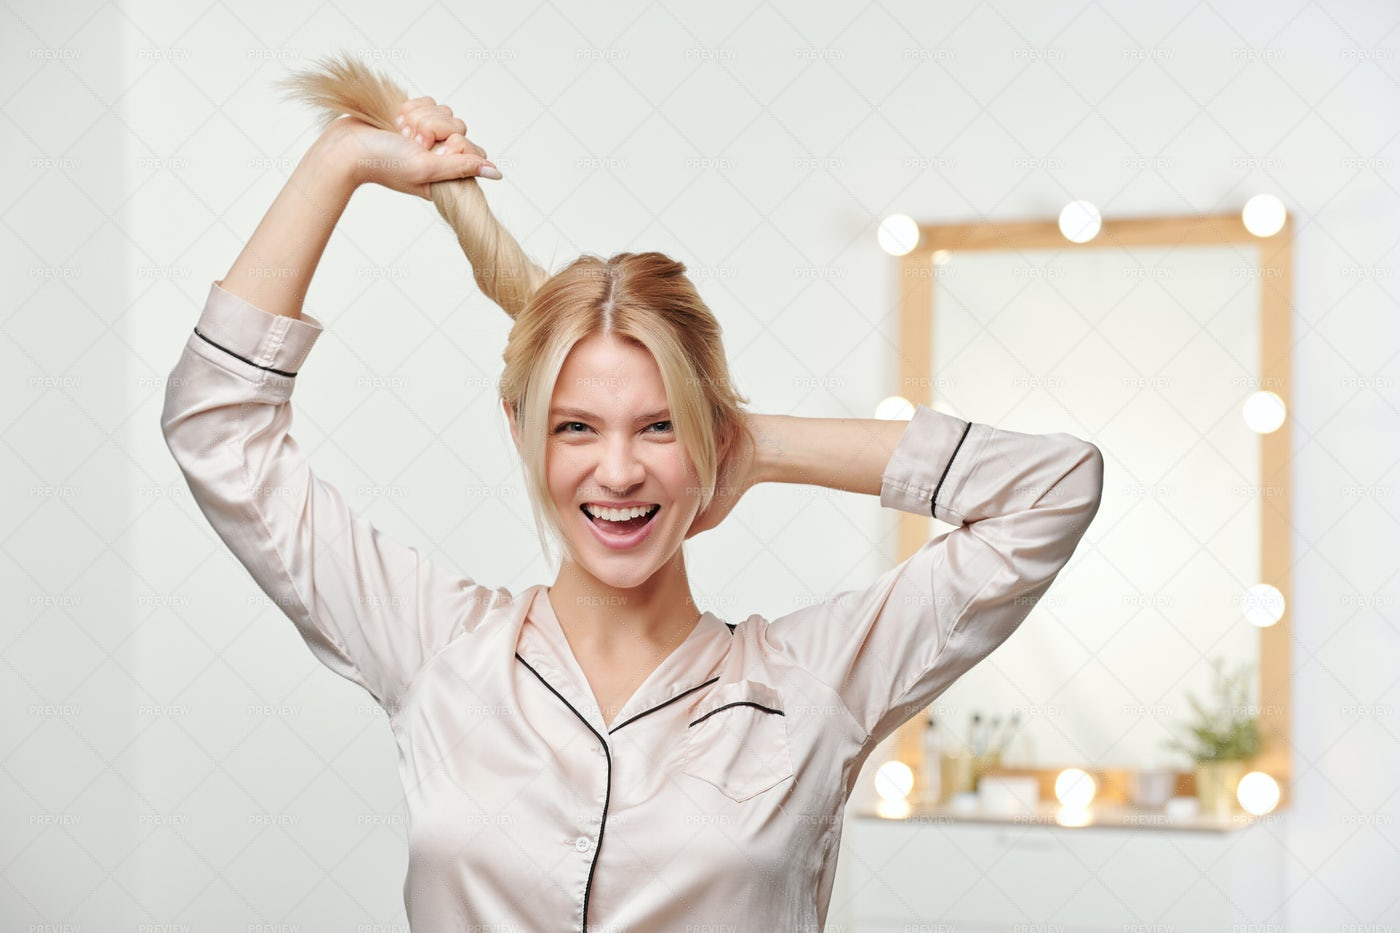 Pretty Joyful Girl Holding Ponytail...: Stock Photos